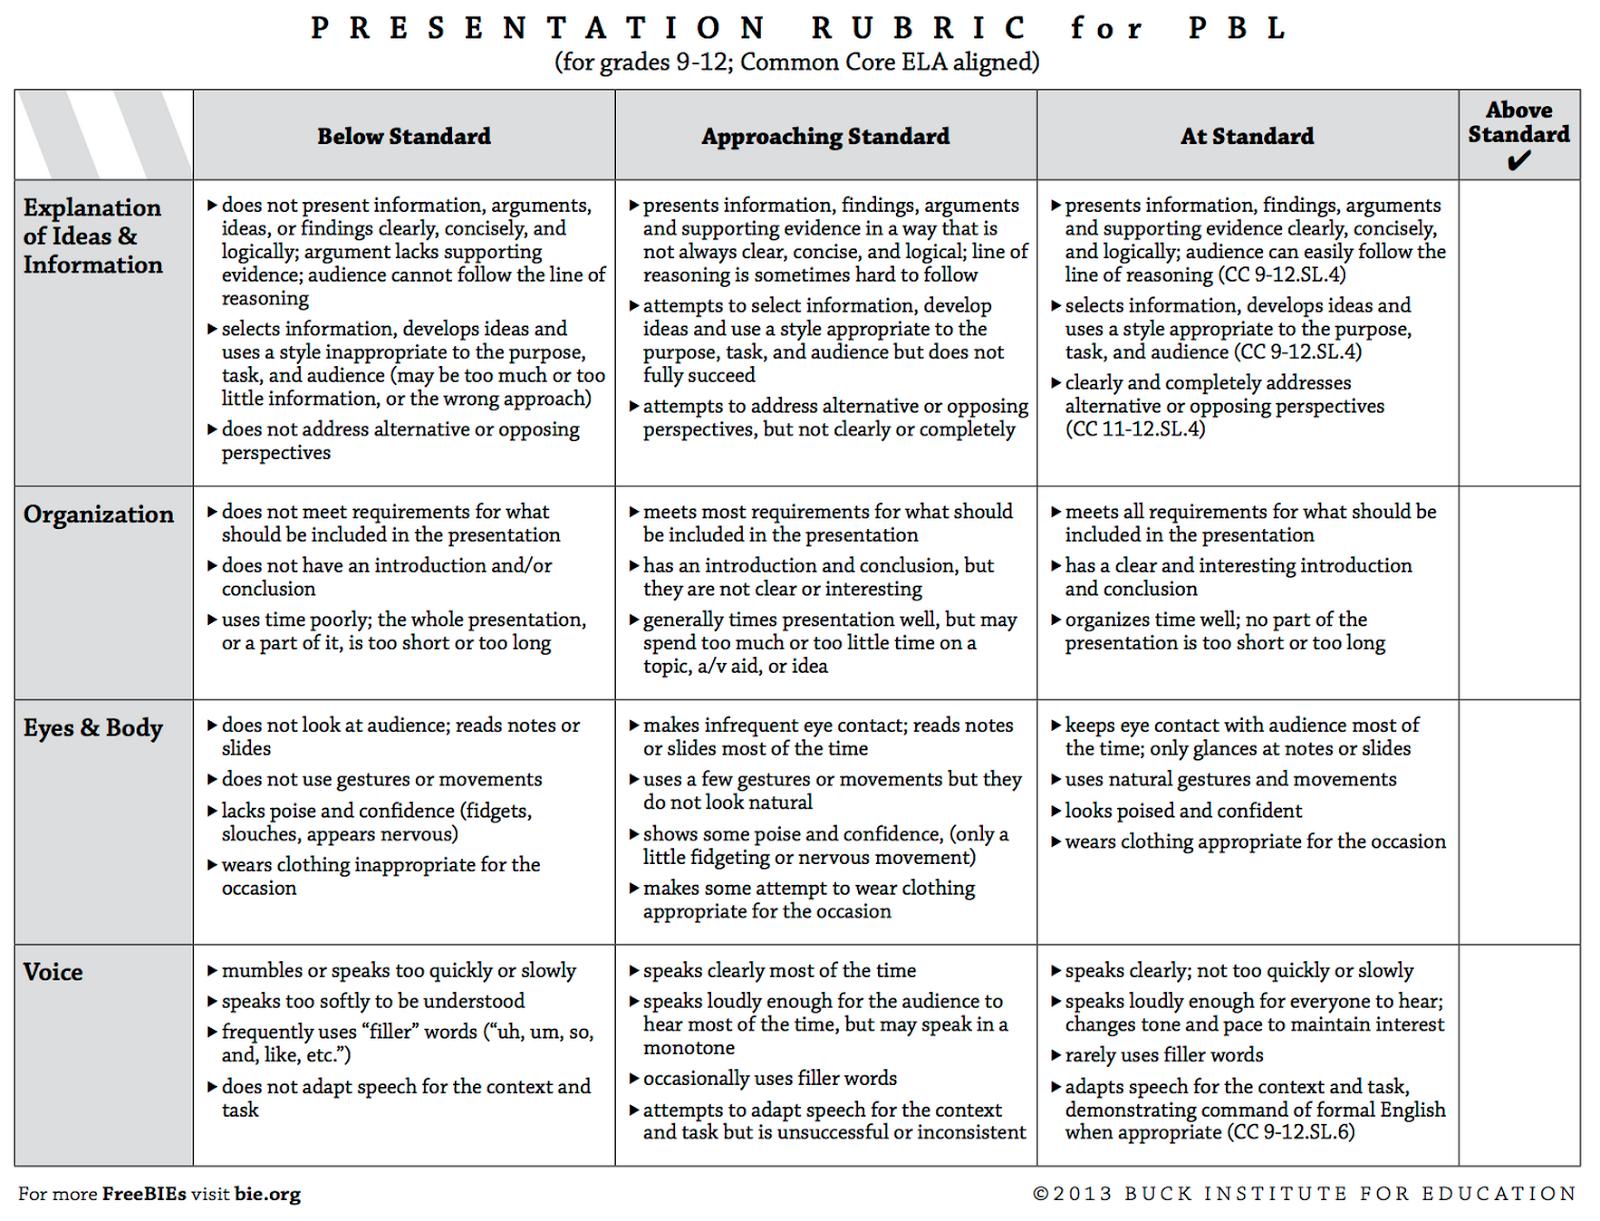 4 Great Rubrics To Develop Students Presentations And Speaking Skills Presentation Rubric Rubrics Student Presentation